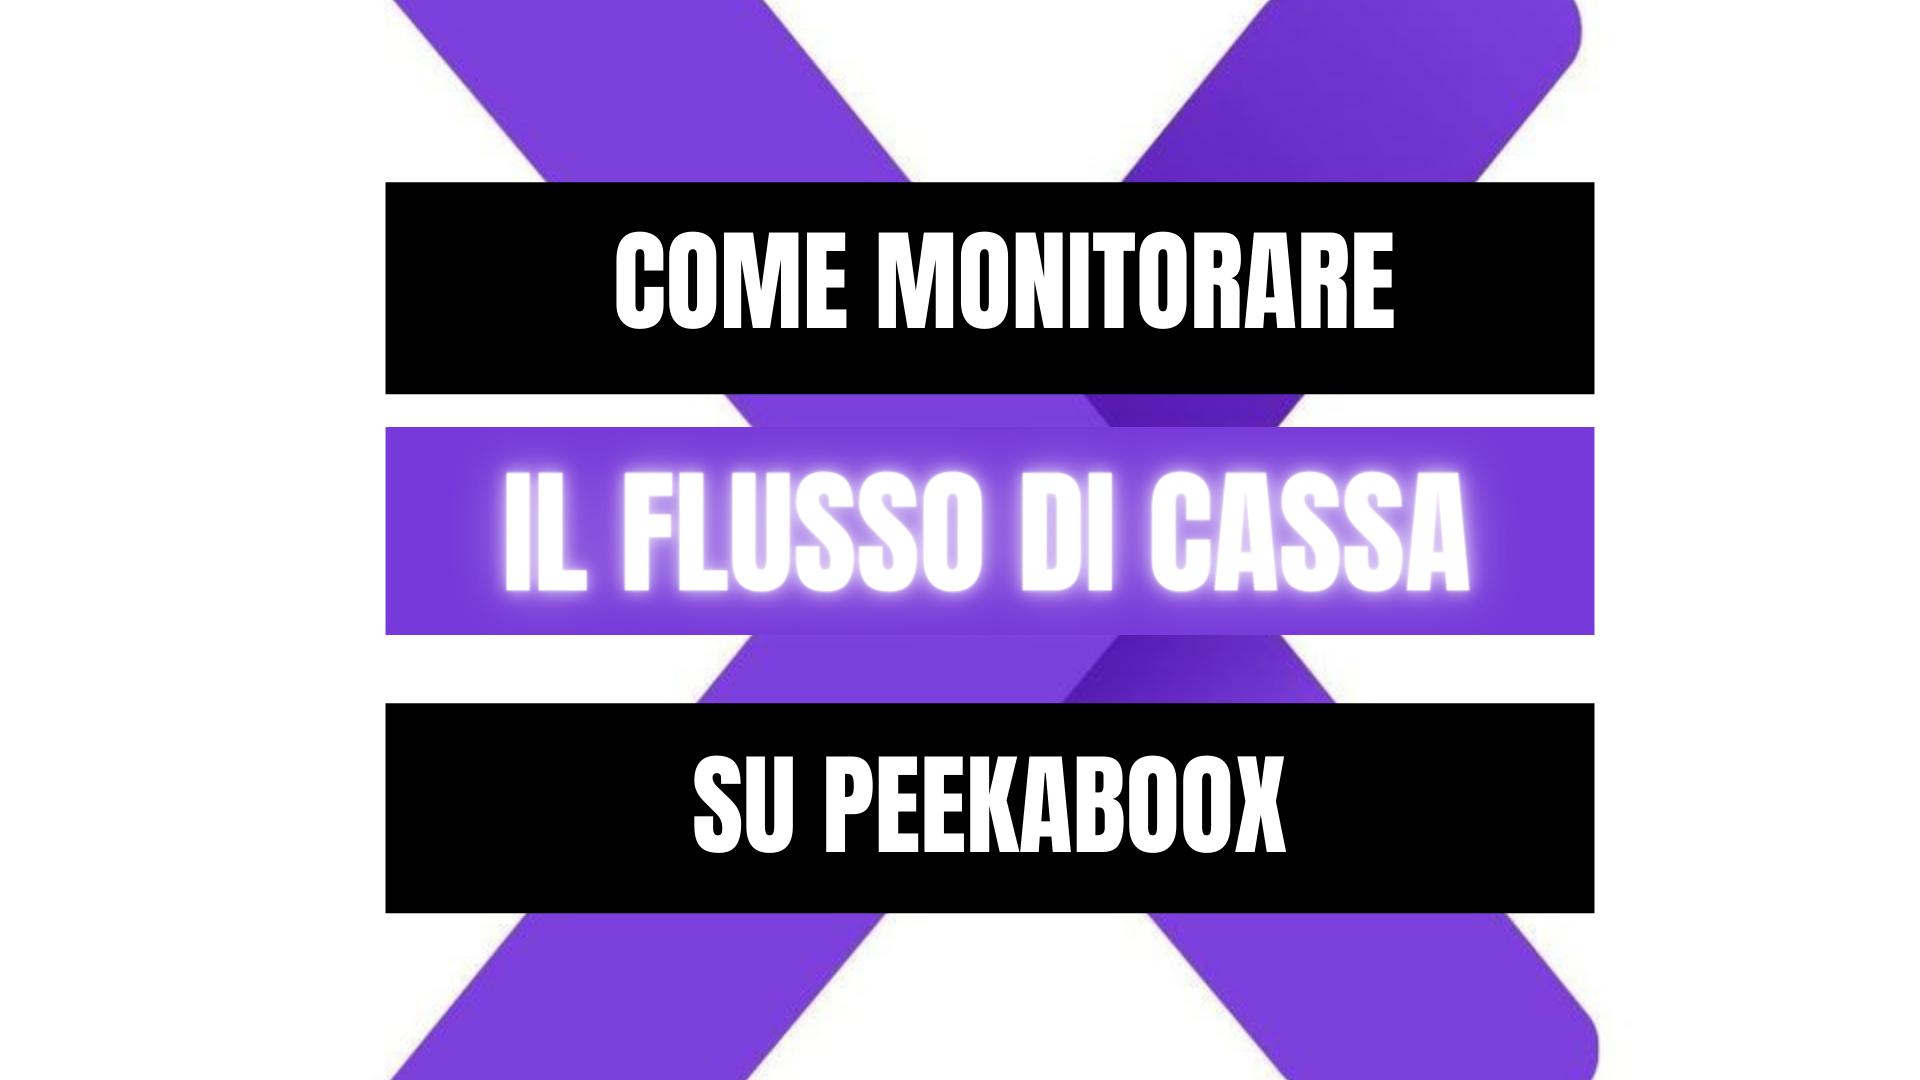 Peekaboox - Monitor the Cash Flow